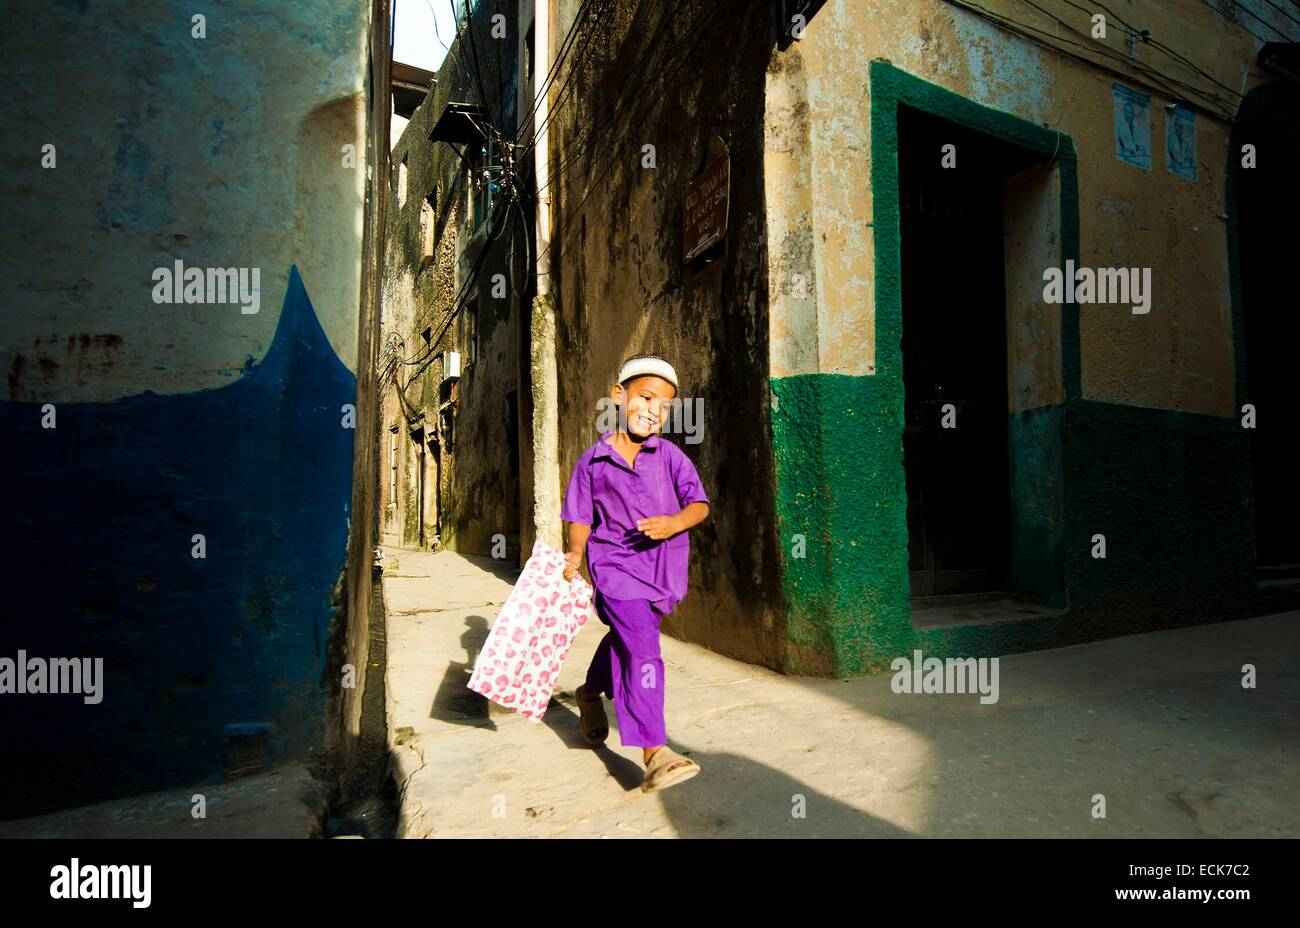 Kenya, Lamu archipelago, Lamu, schoolboy running in the street - Stock Image